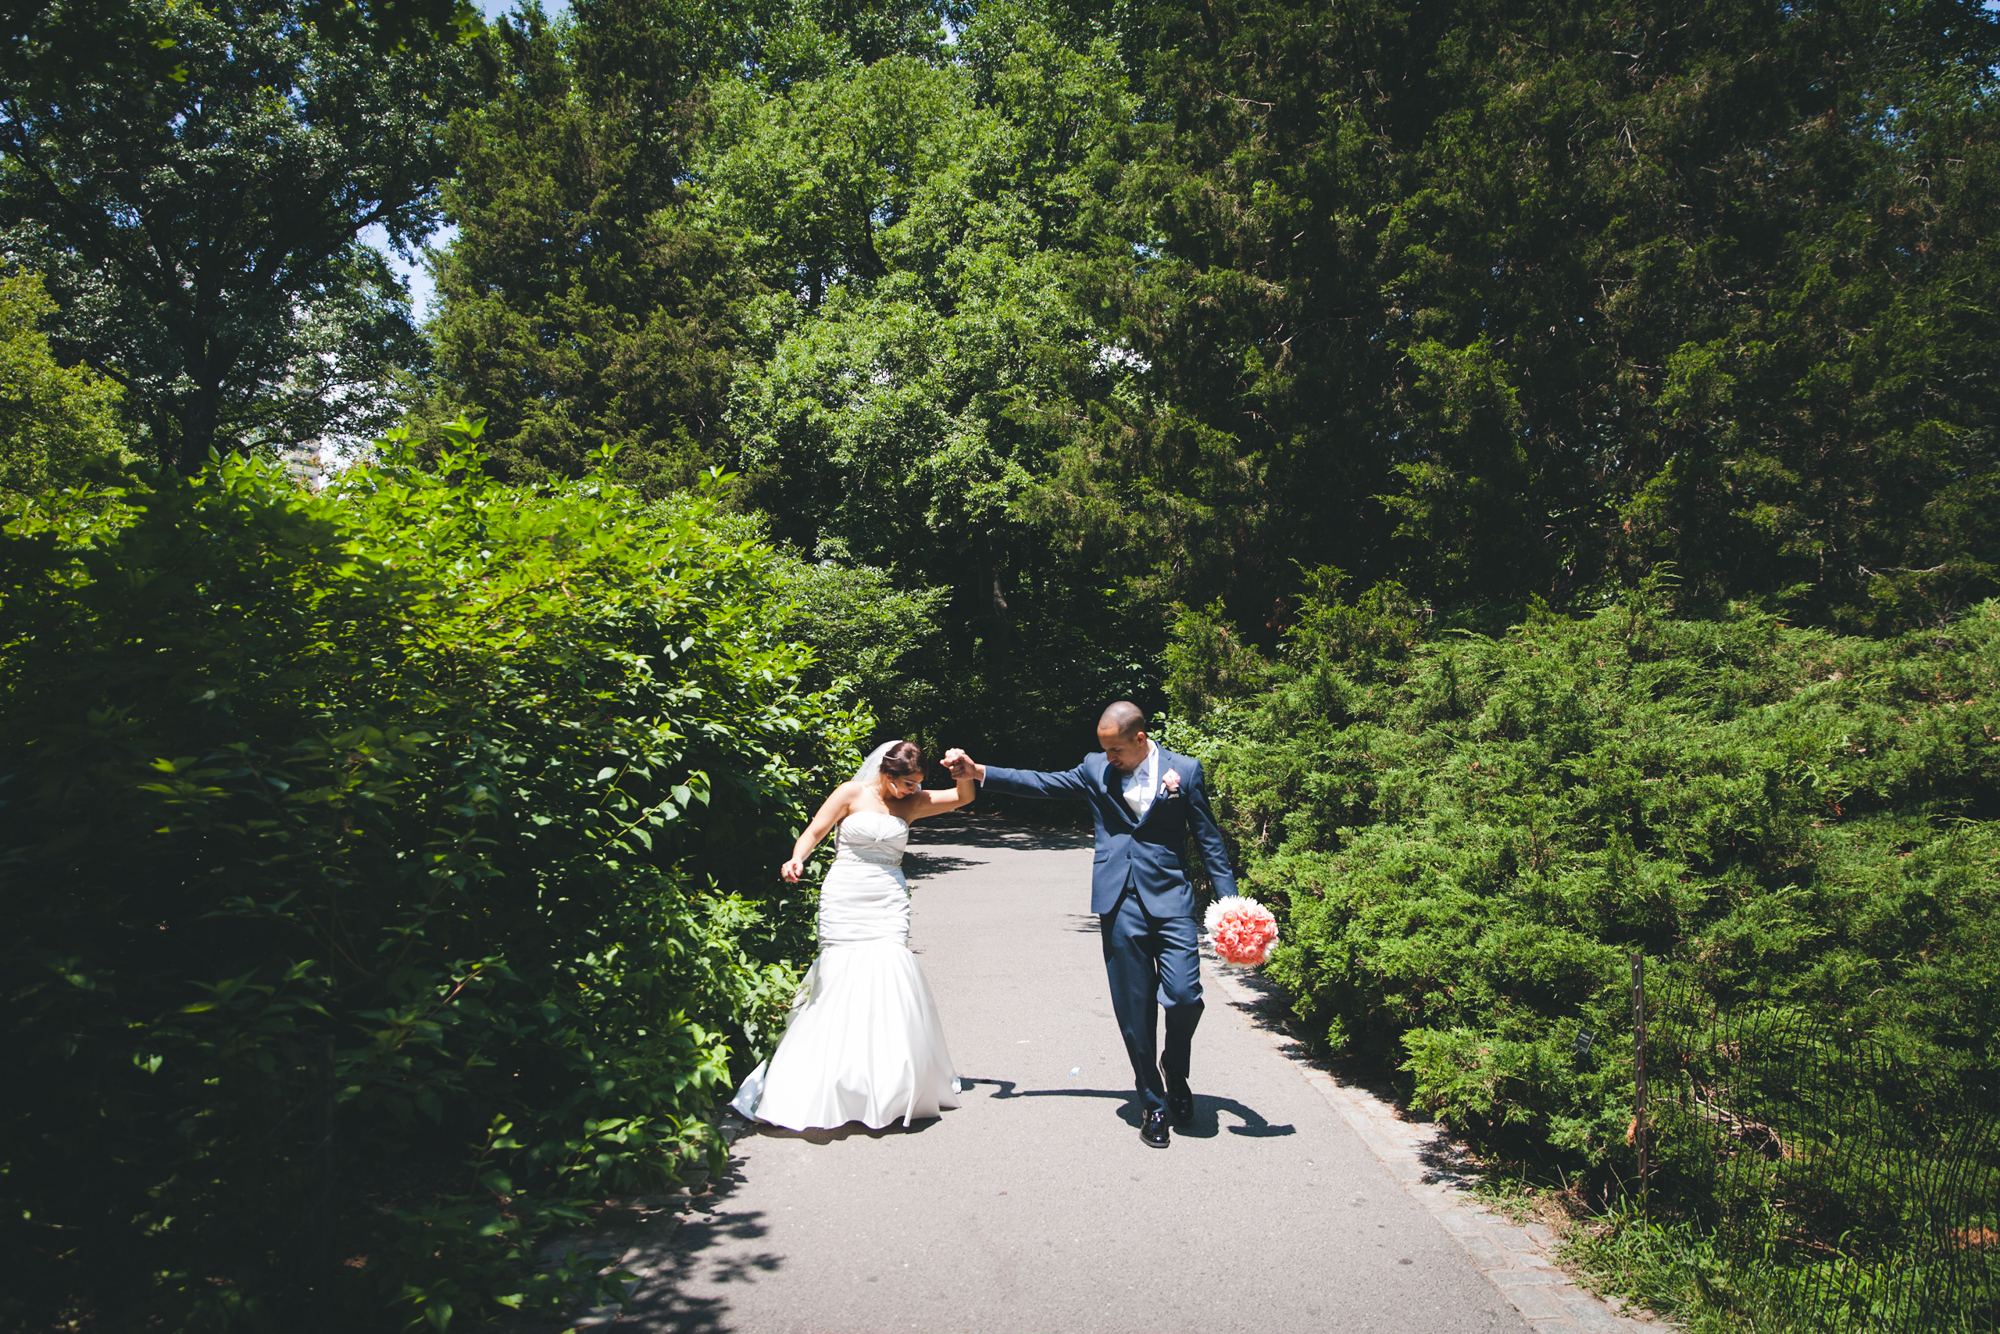 PriscillaJeffrey-Central-Park-Wedding-Elopement-Photography-NYC-24.jpg